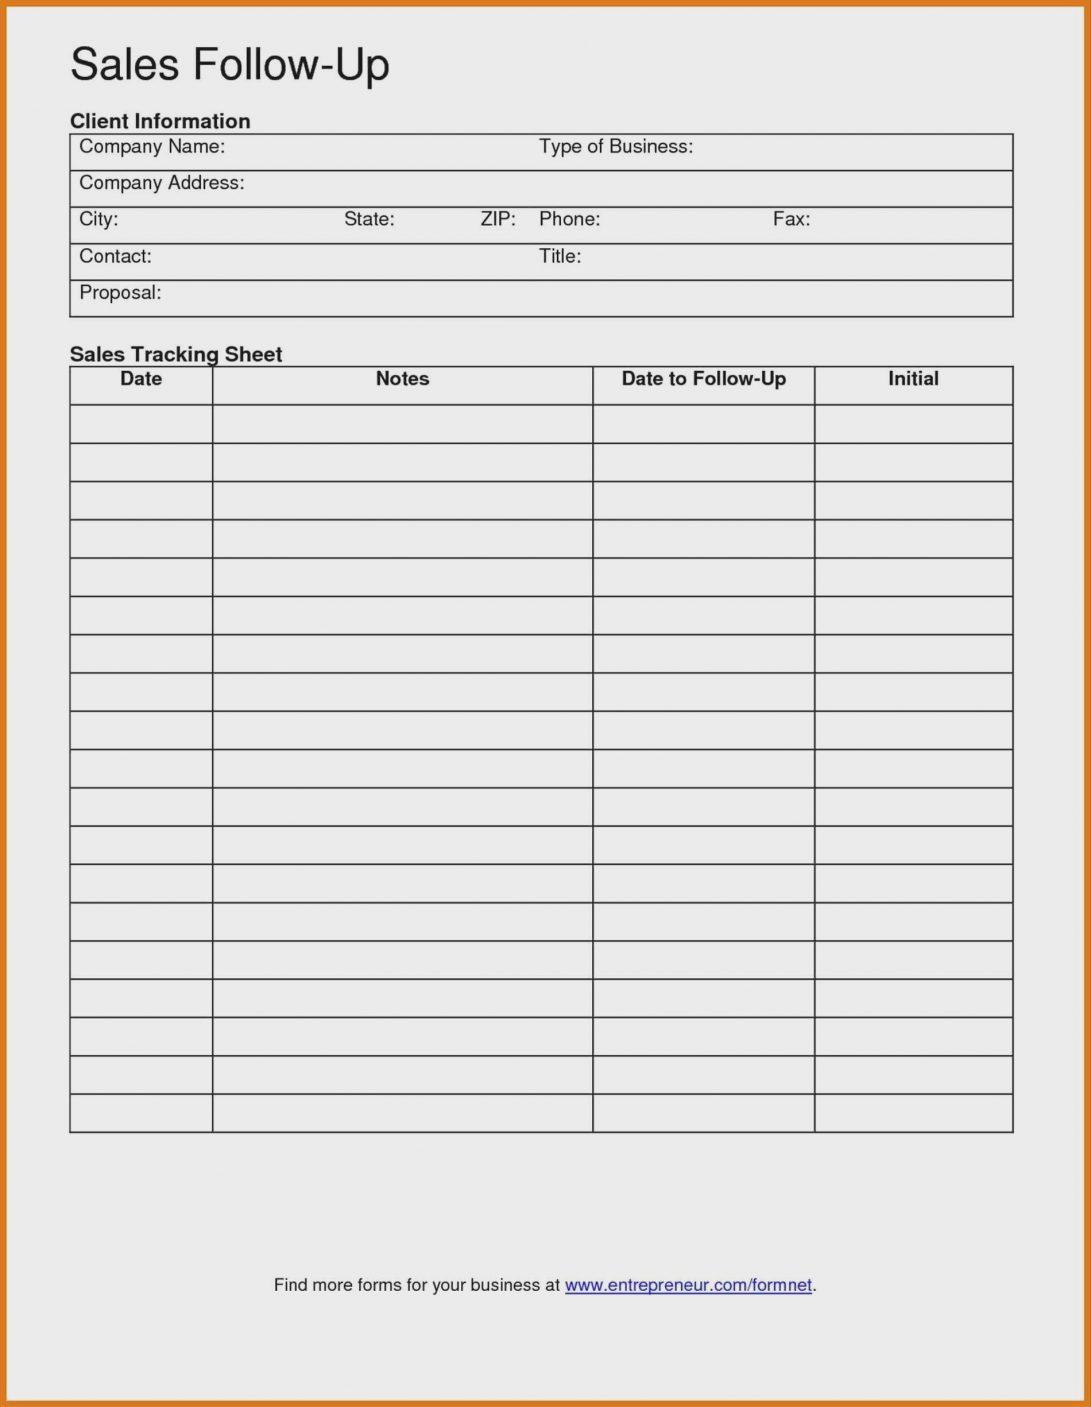 Sales Lead Form Template Sheet Eliolera Together With Forms With Sales Lead Template Forms